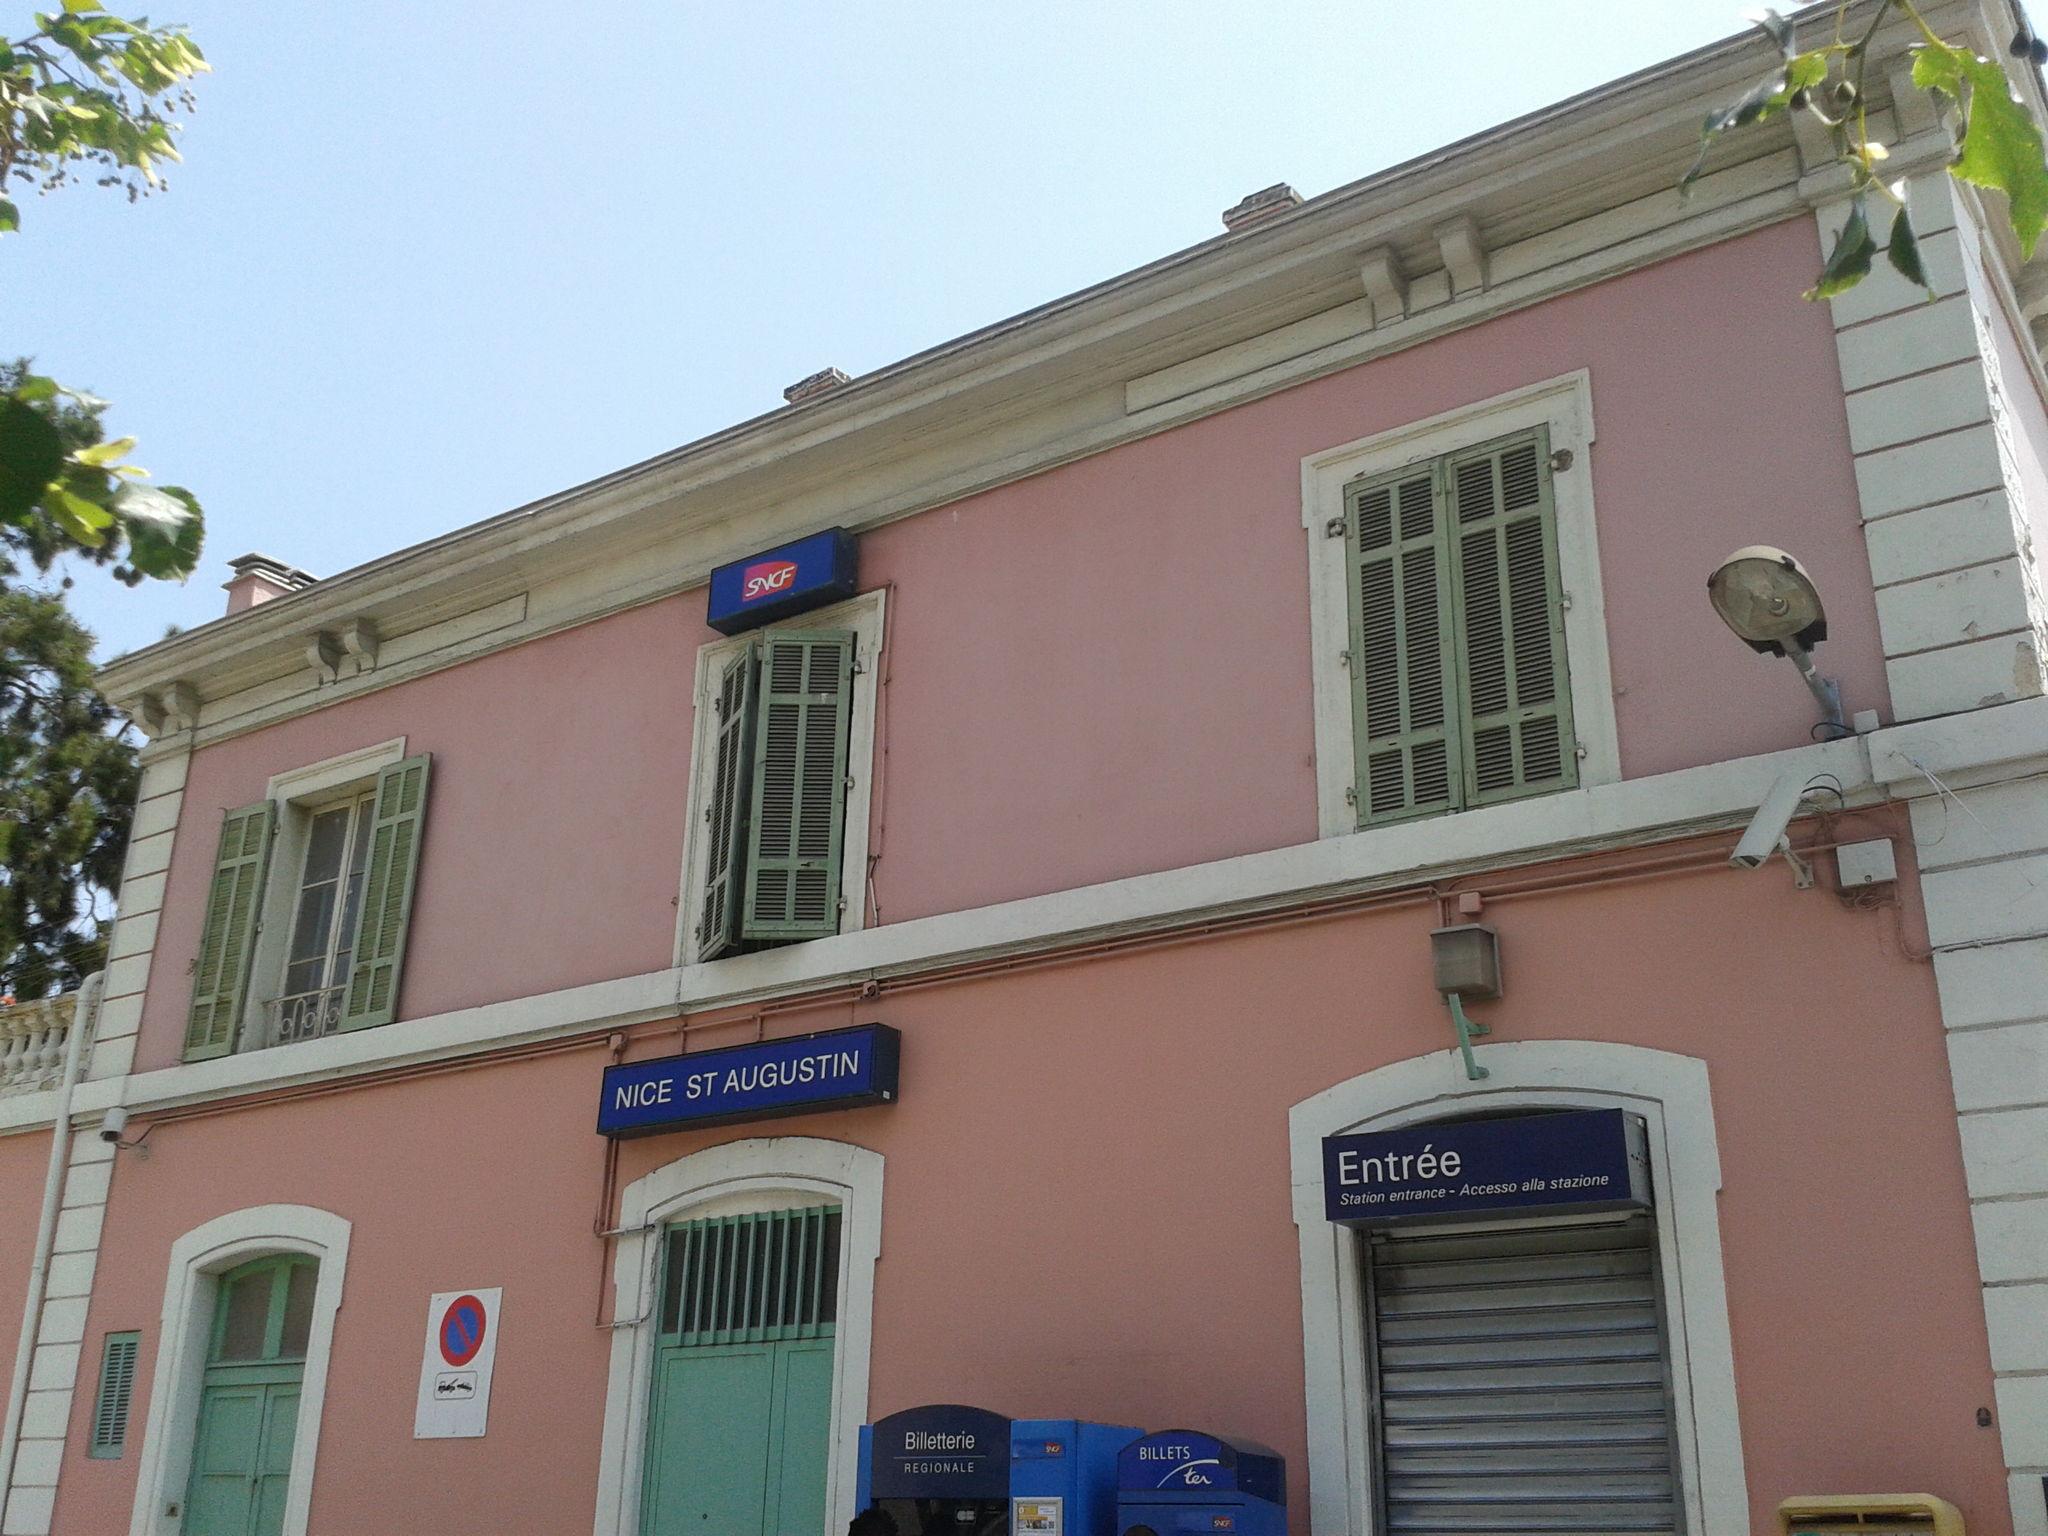 Nice Saint-Augustin (Alpes-Maritimes) BV